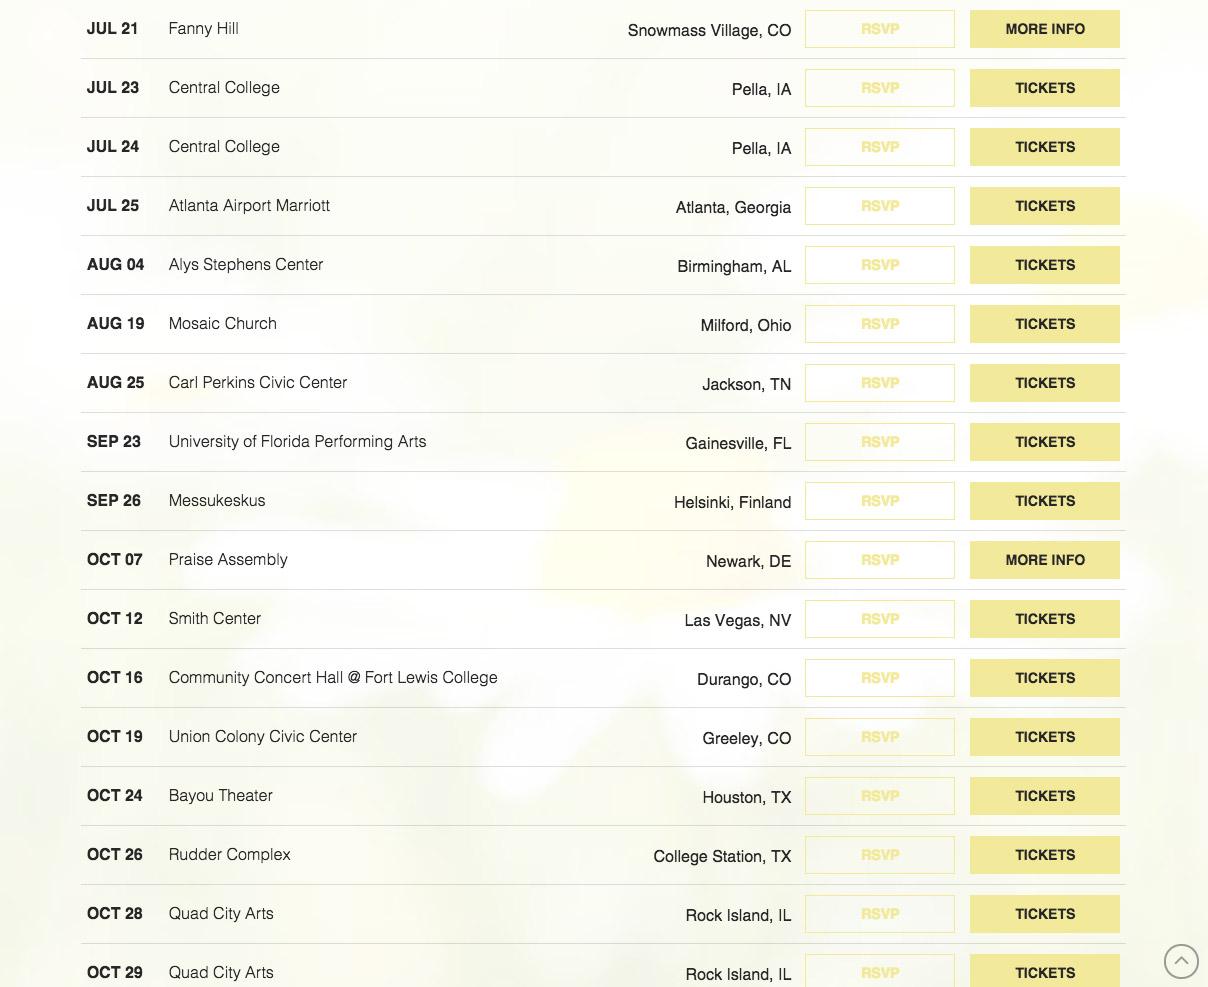 mandy harvey website screenshot of tour dates